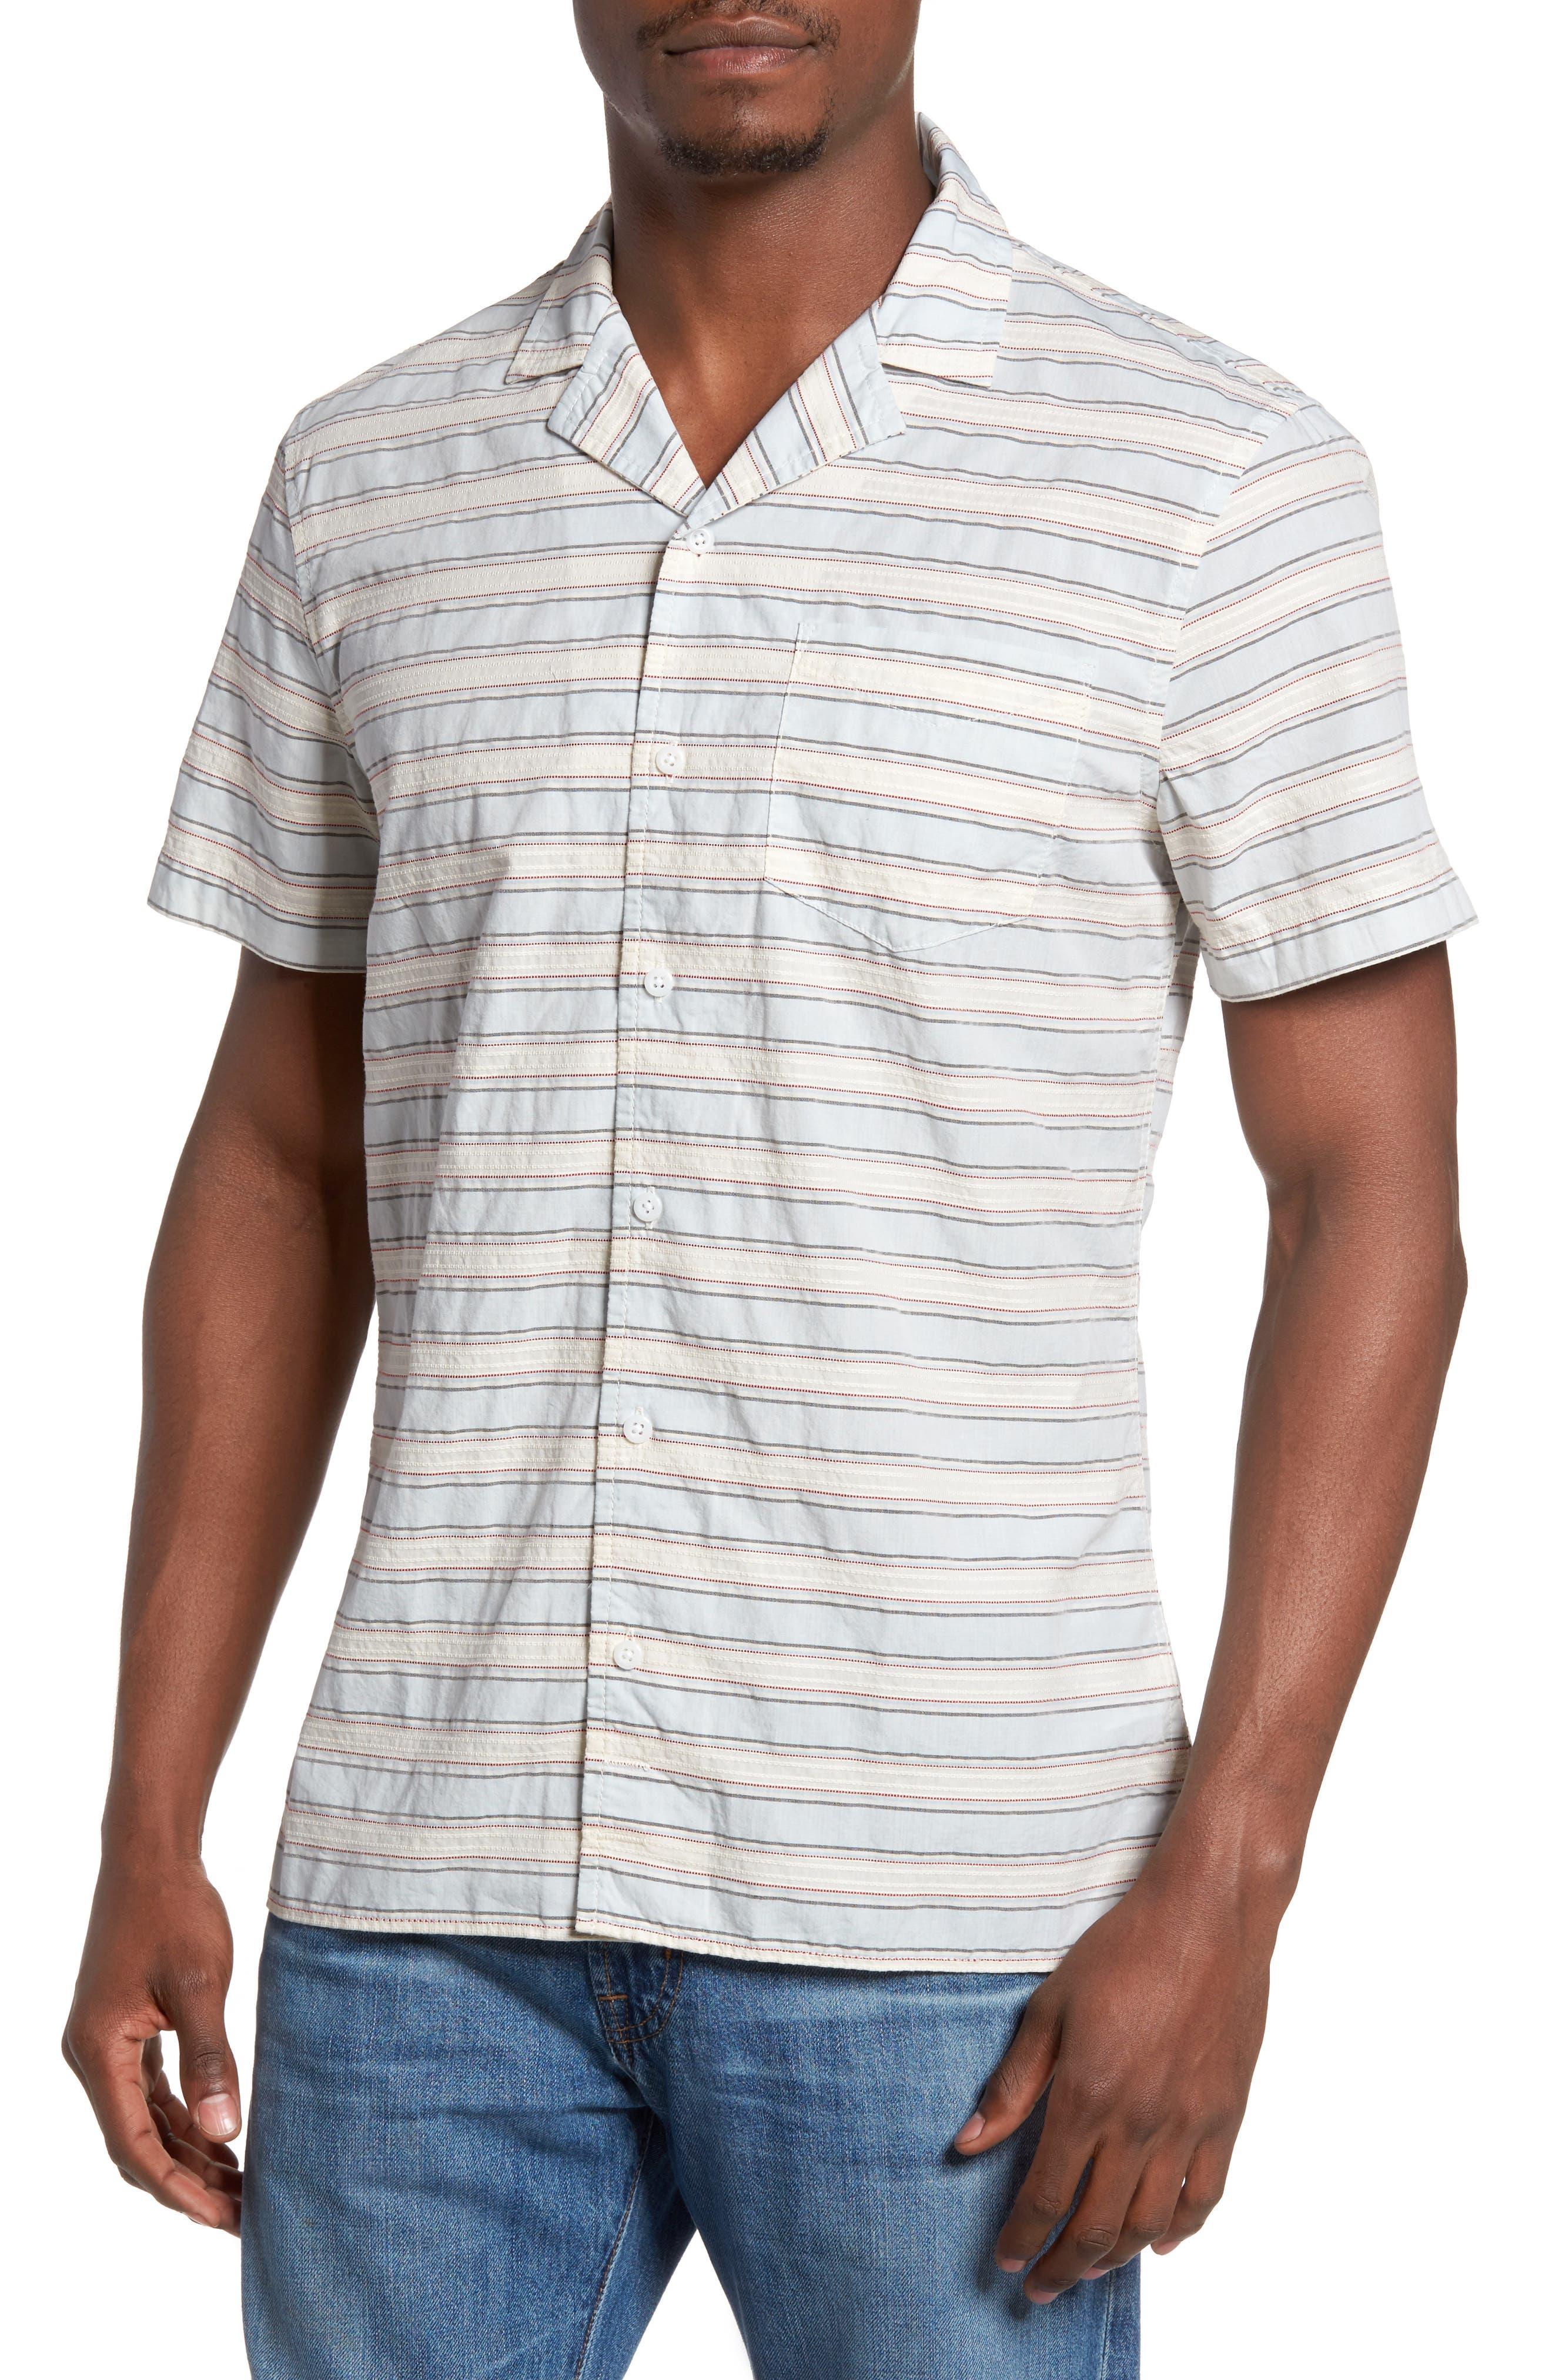 Main Image - 1901 Jacquard Stripe Camp Shirt